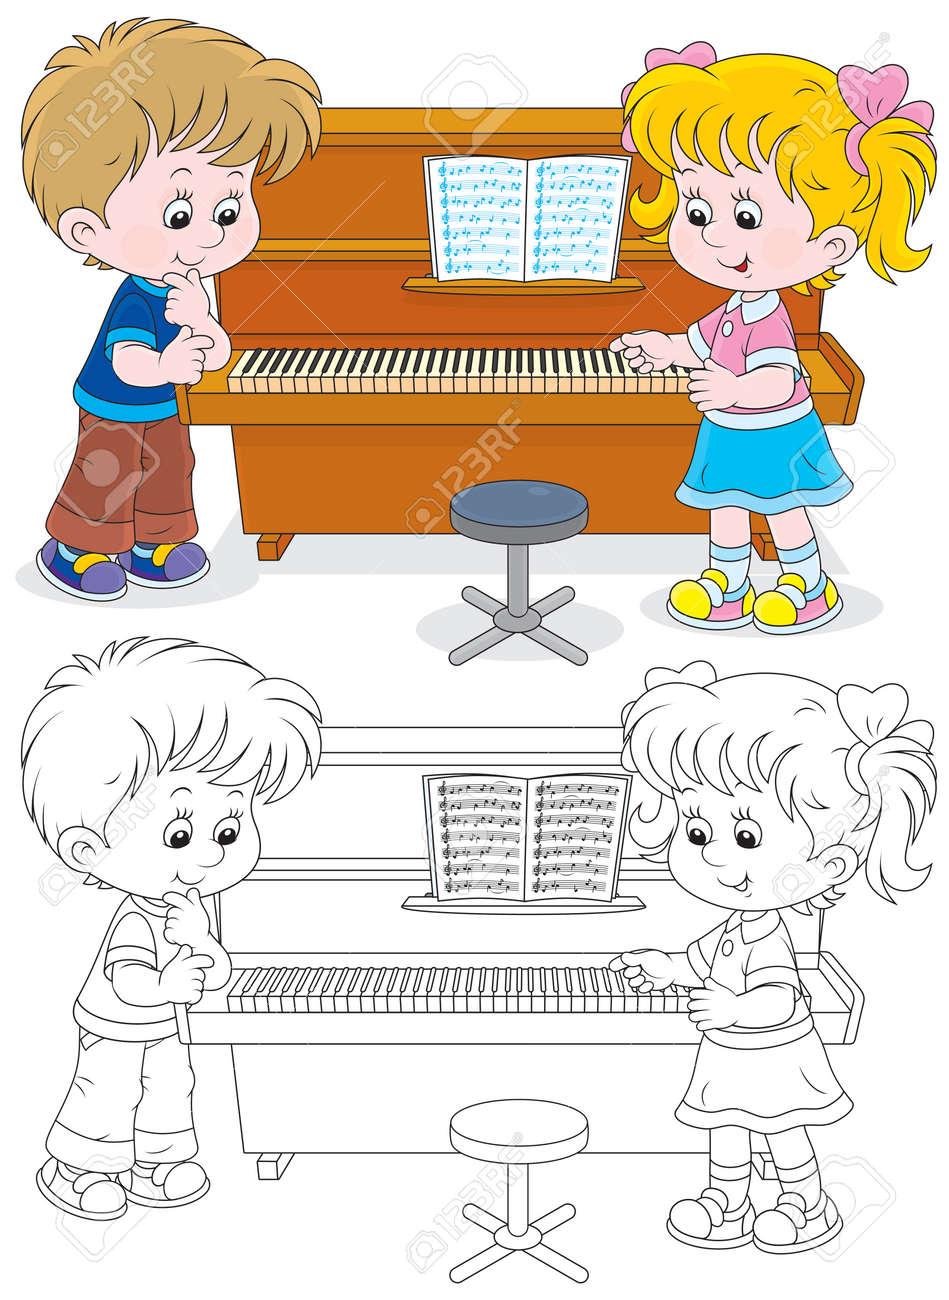 Niña Y Un Niño Tocando Un Piano